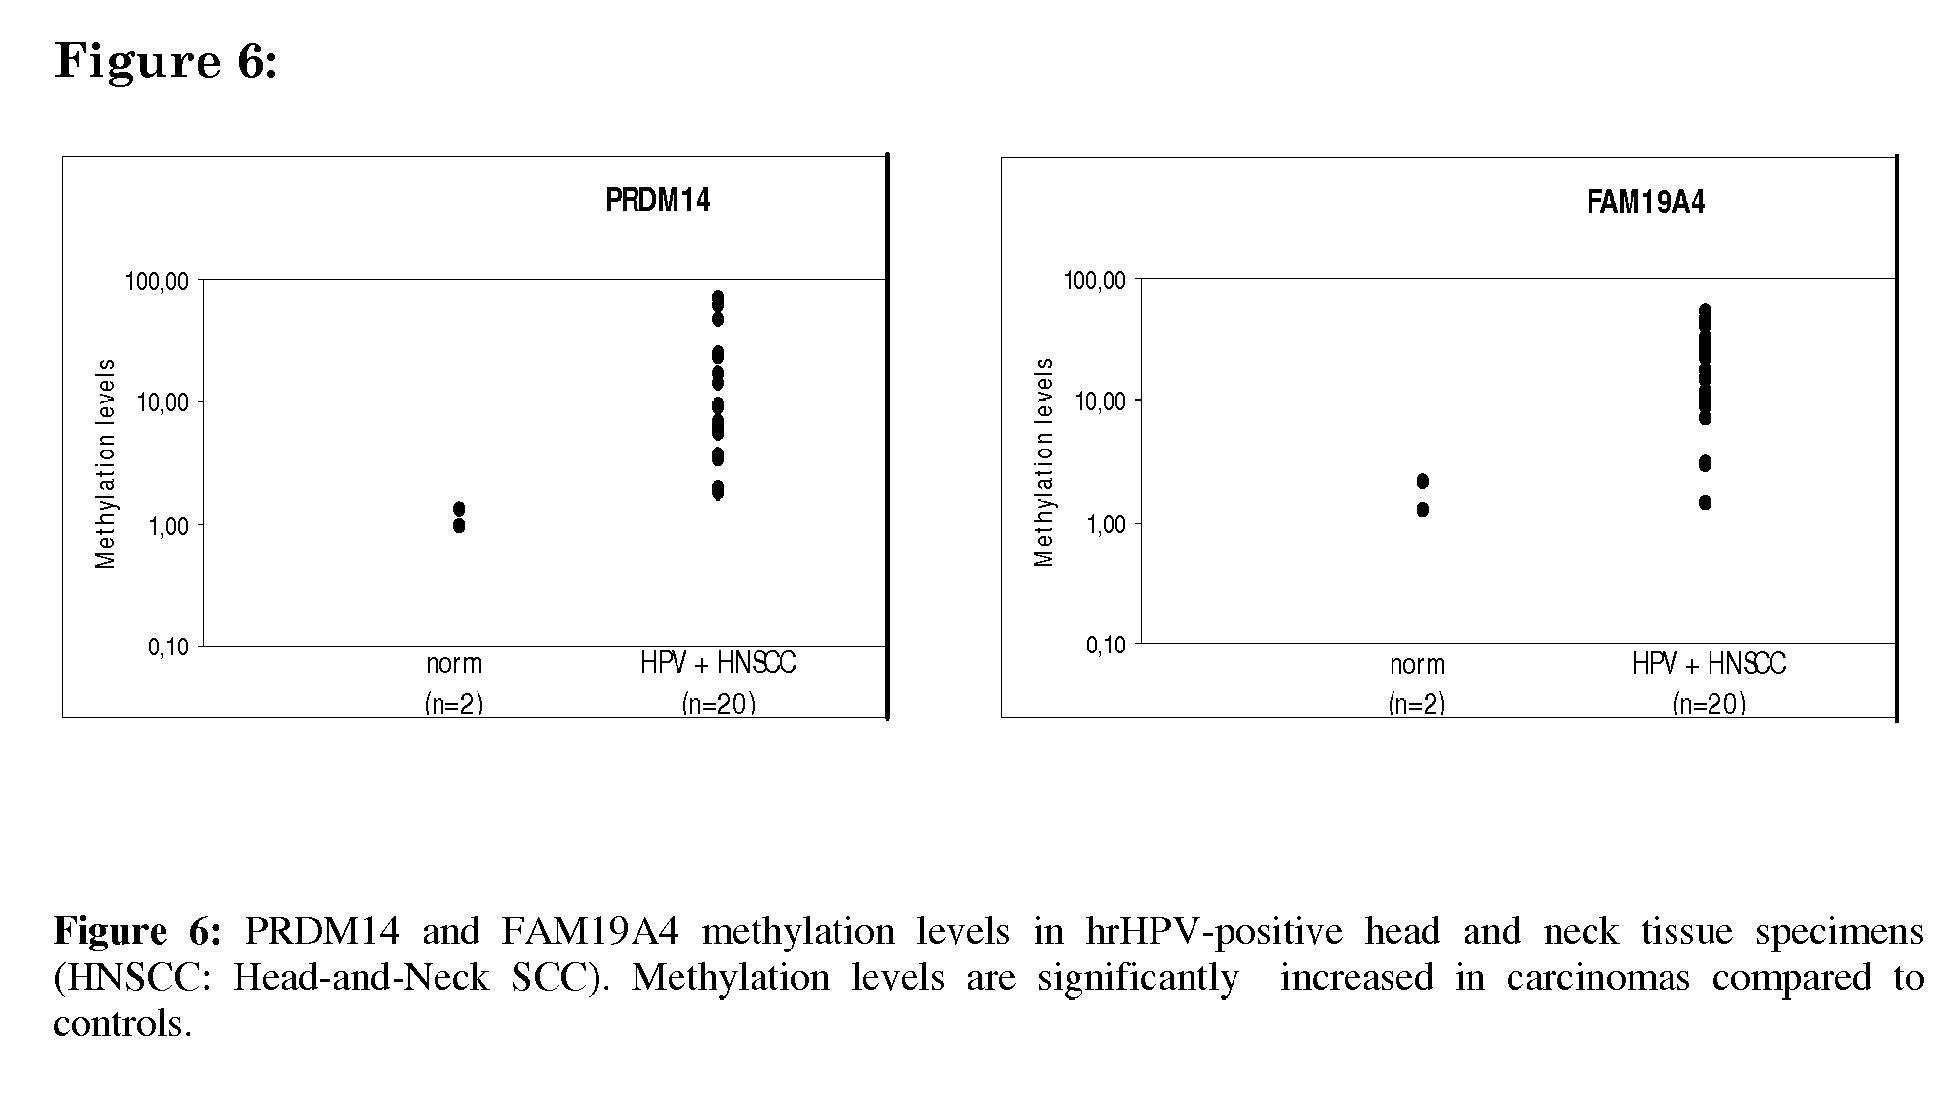 hpv niveau 2